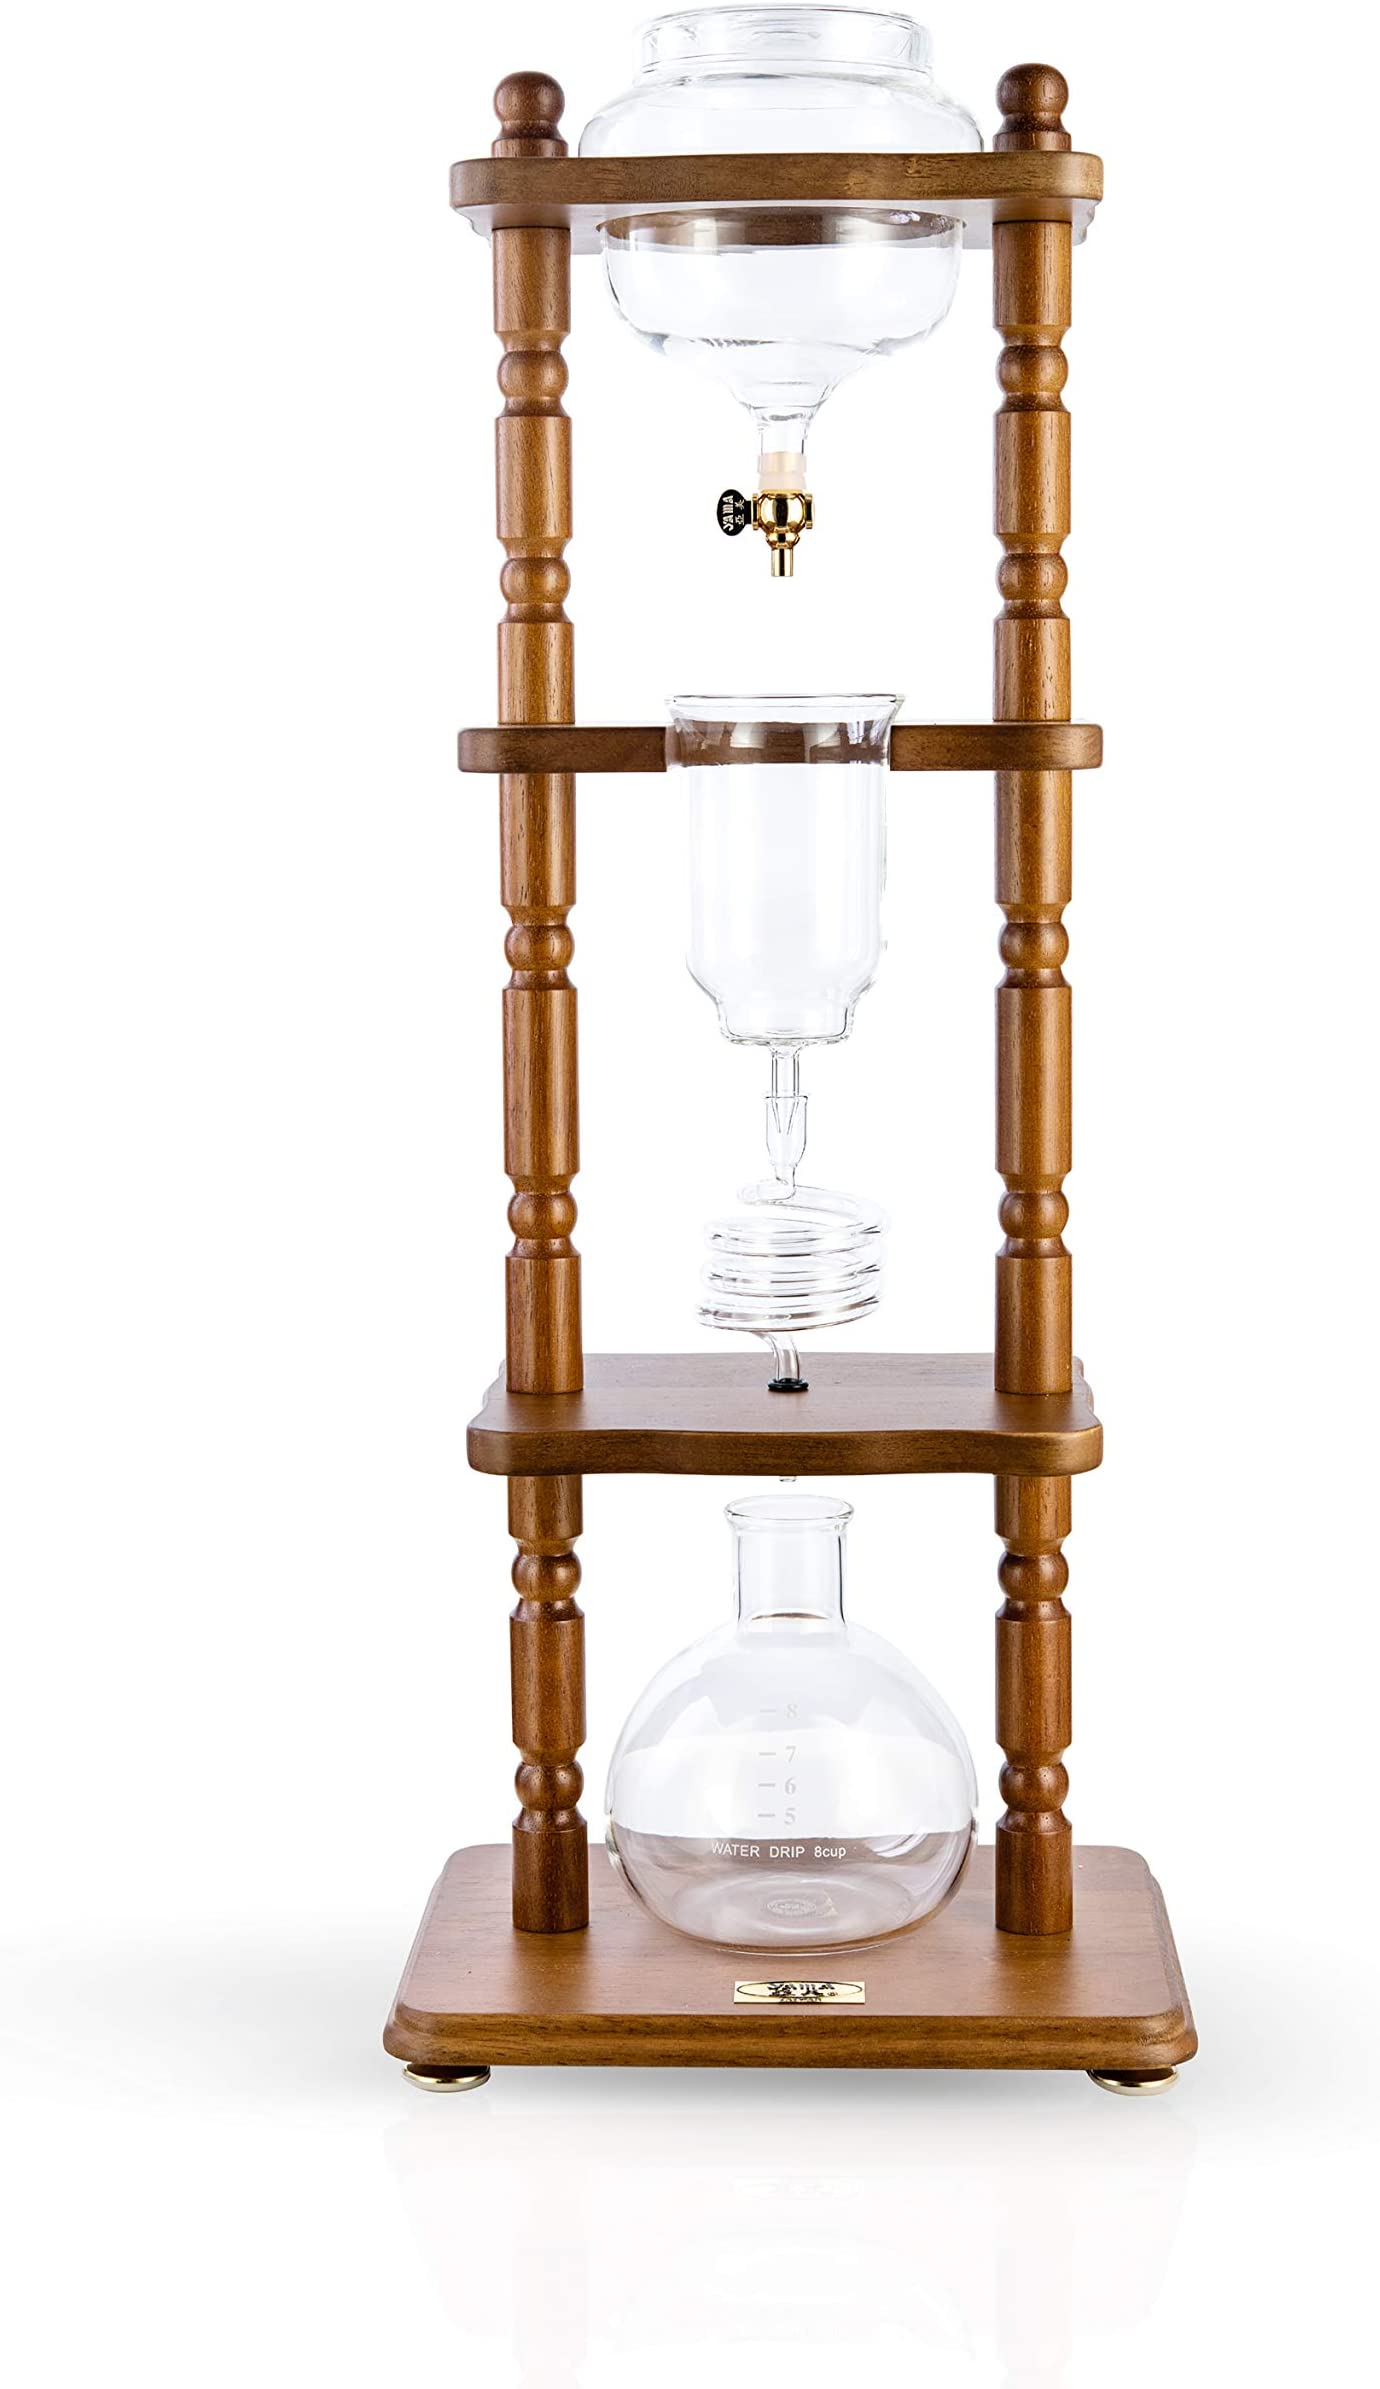 YAMA Glass YAMCDM8CBR, Brown Frame Cold Brew Drip Coffee Maker, 6-8 cup